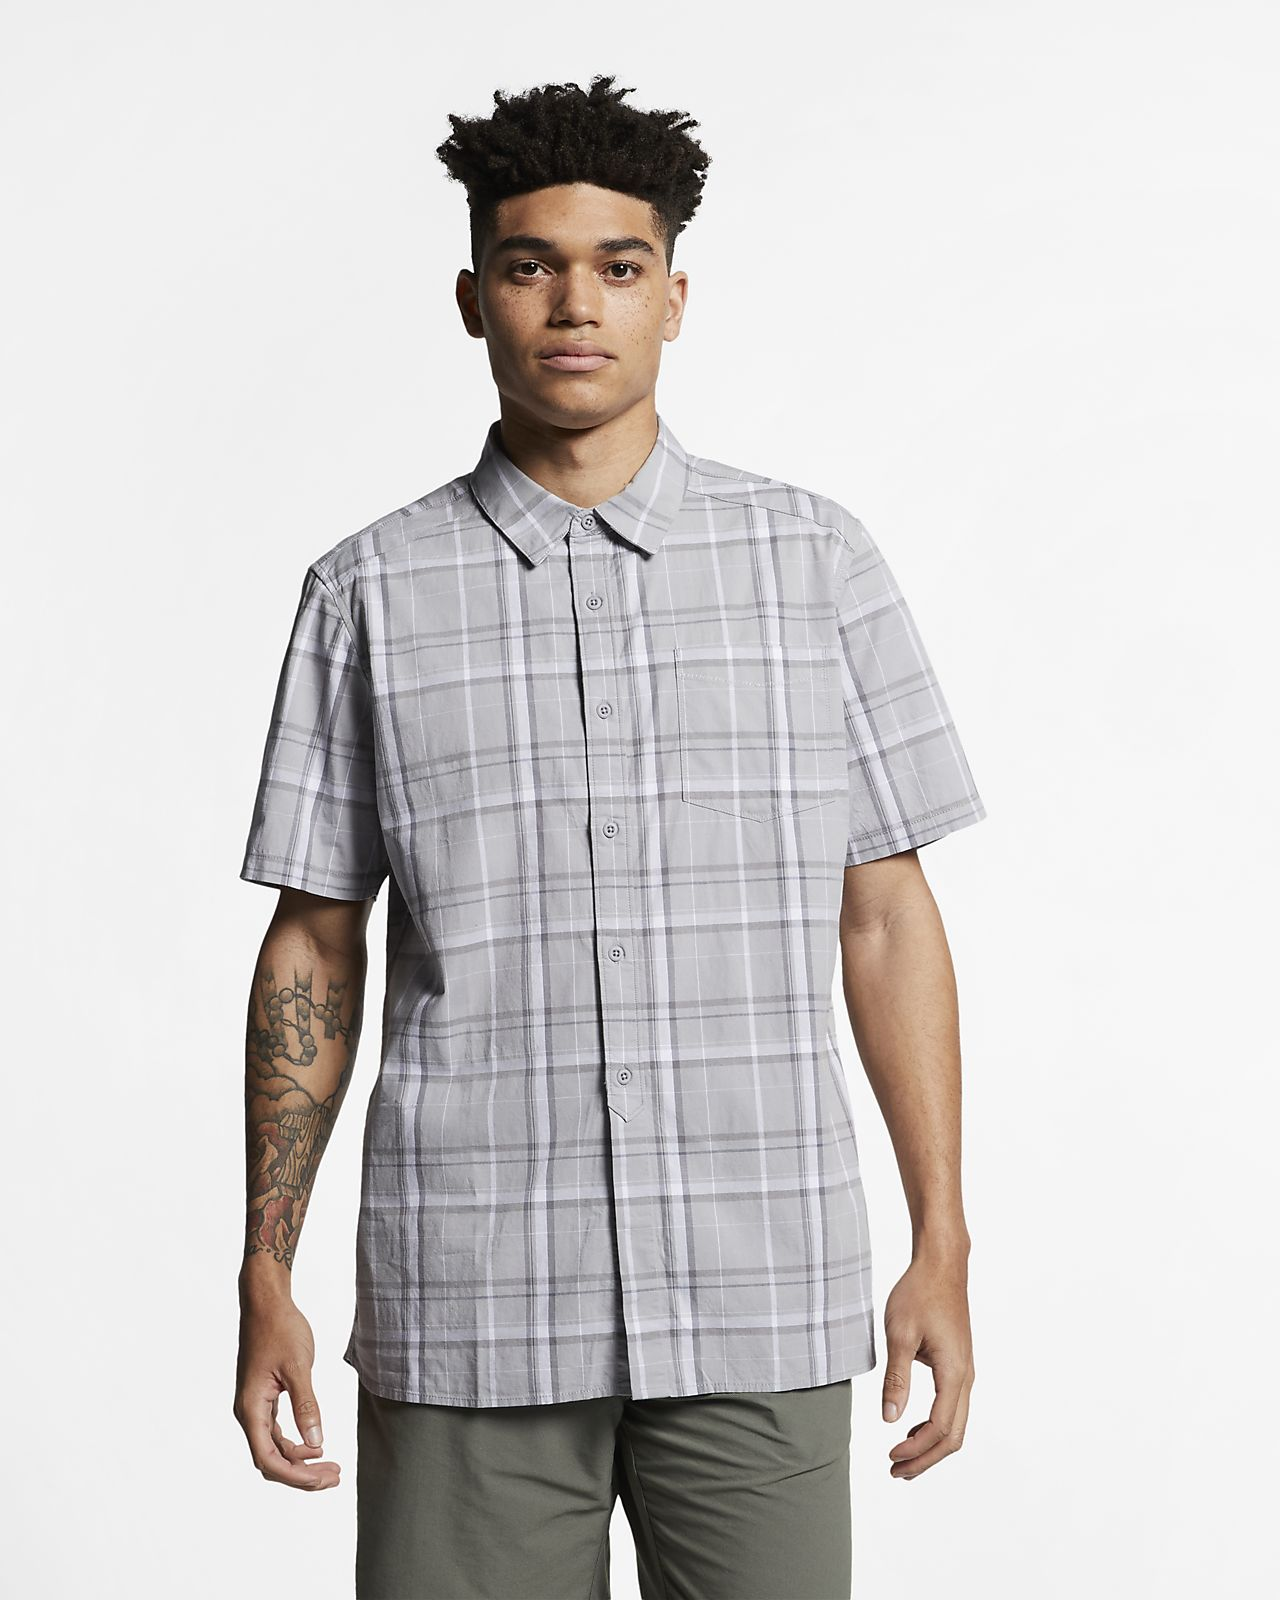 Chemise à manches courtes Hurley Frankie Stretch pour Homme